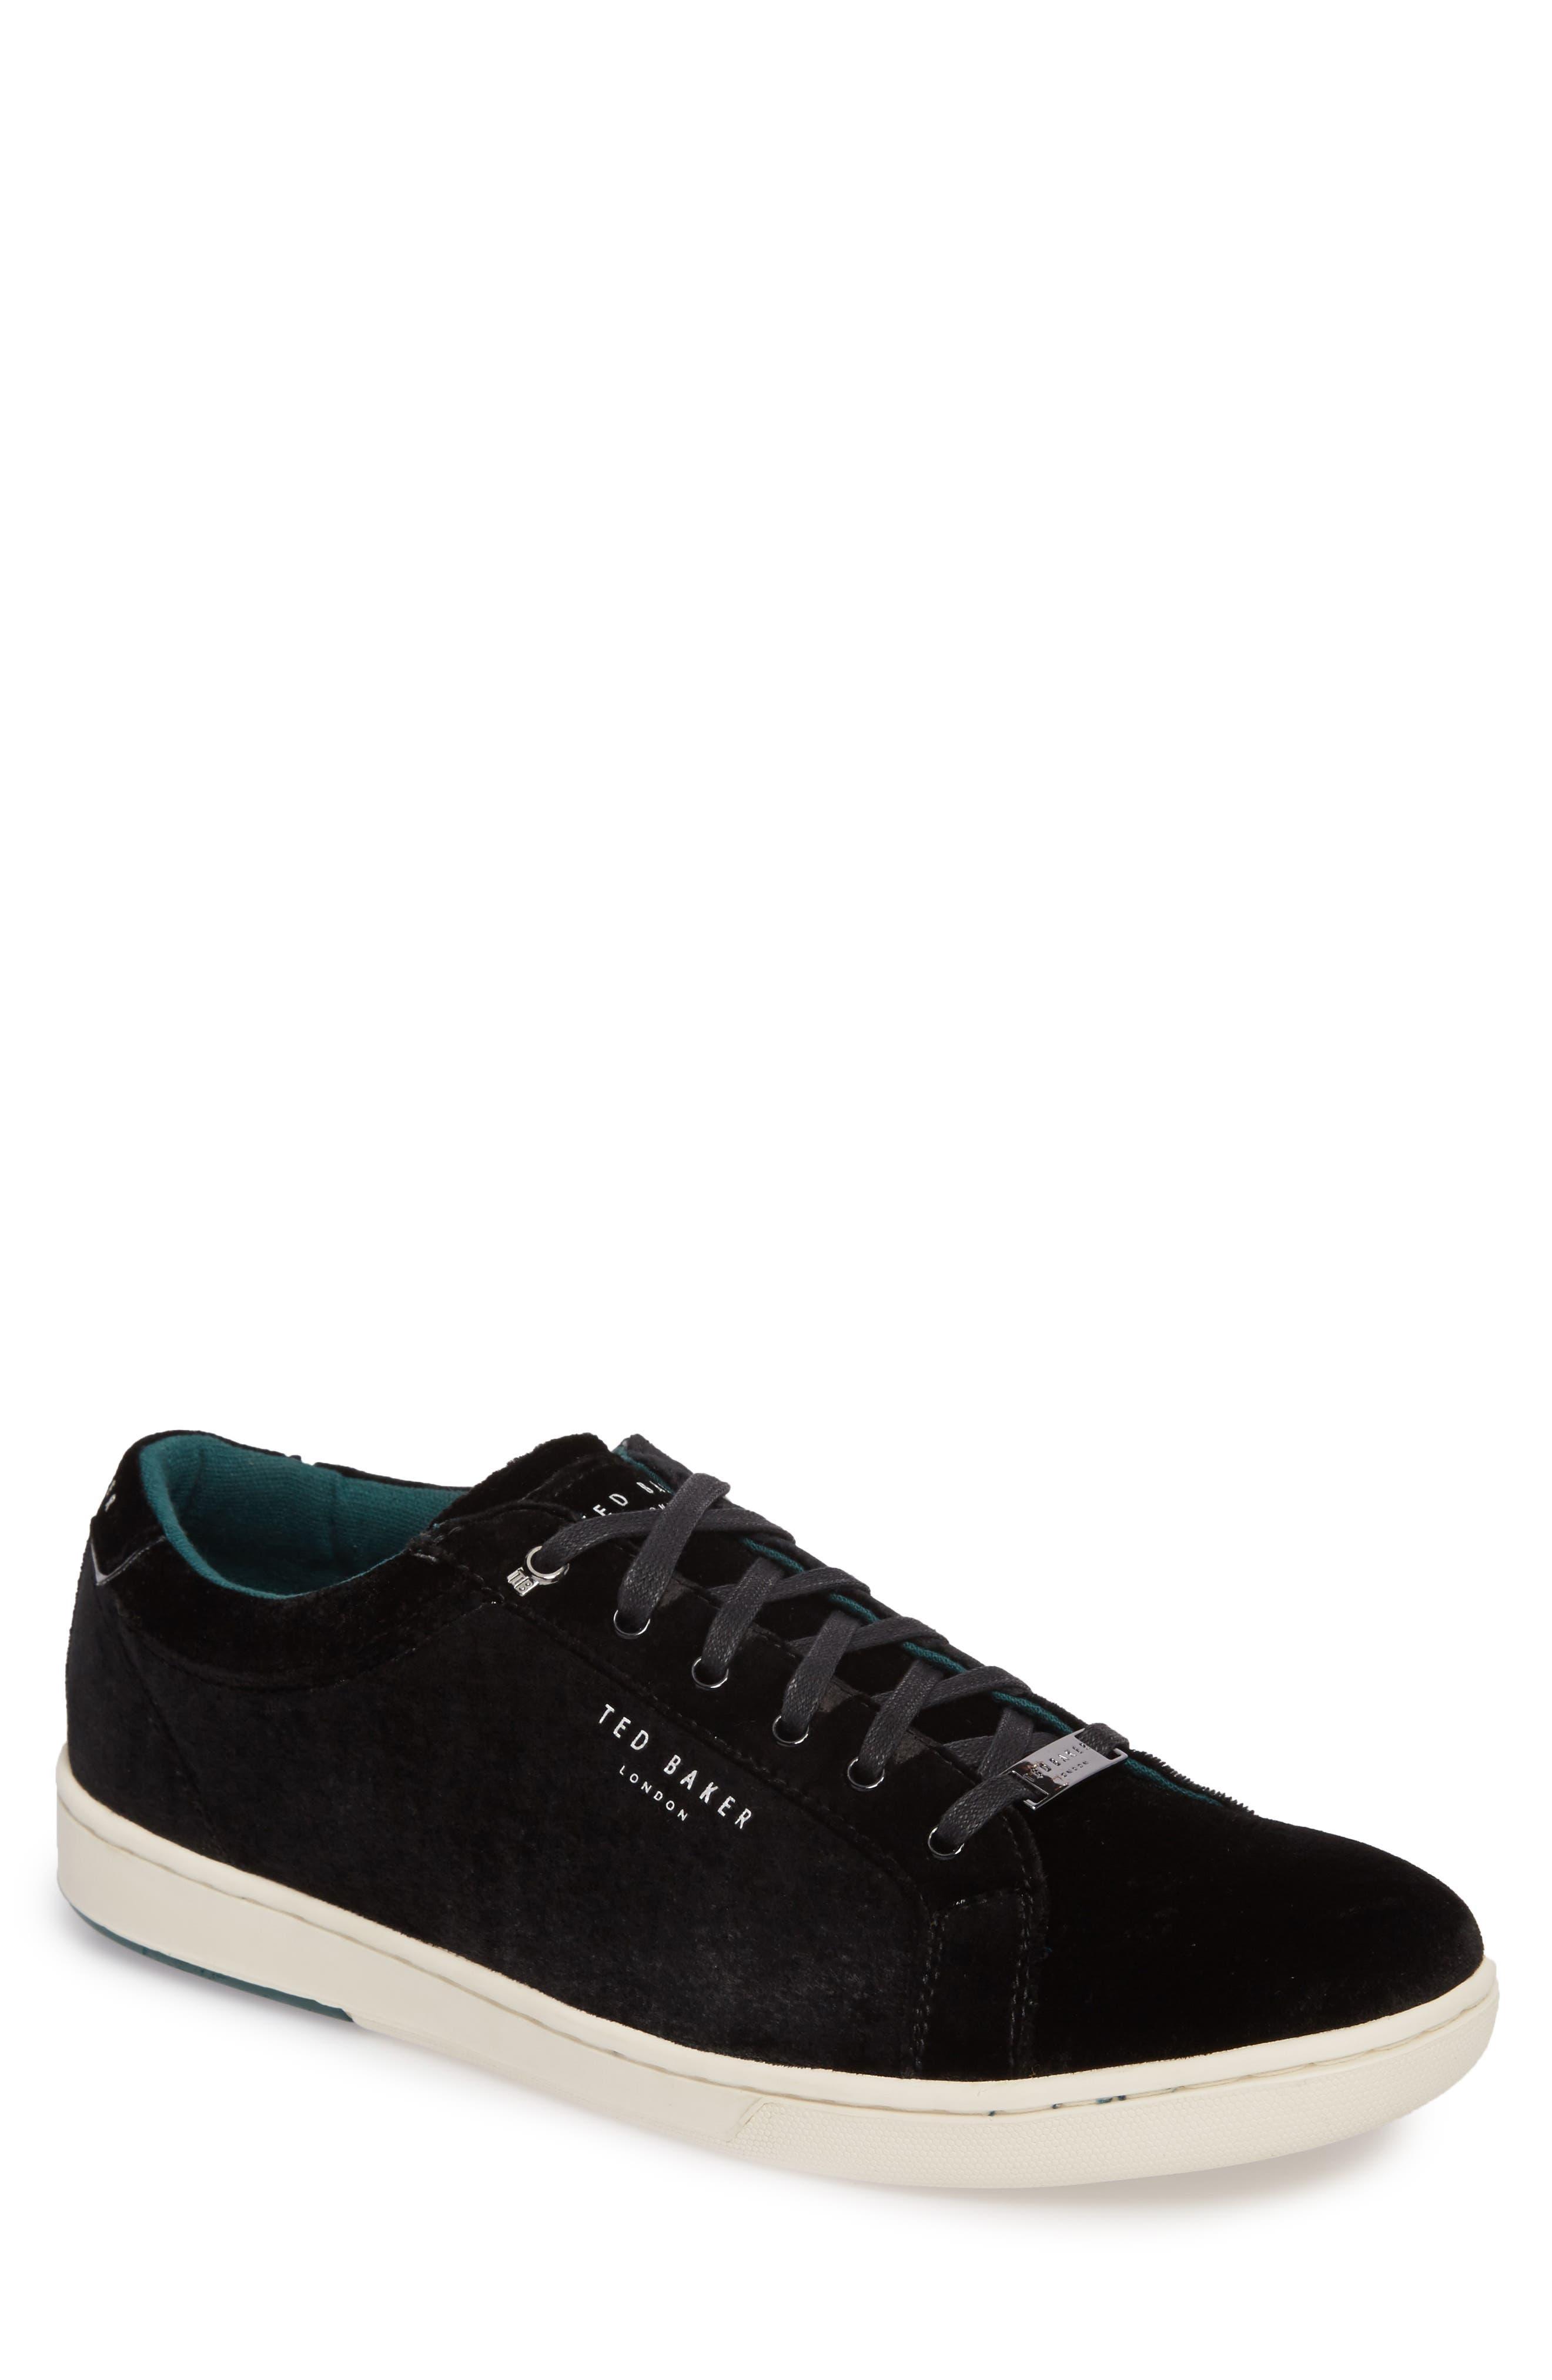 Lambrt Sneaker,                             Main thumbnail 1, color,                             Black